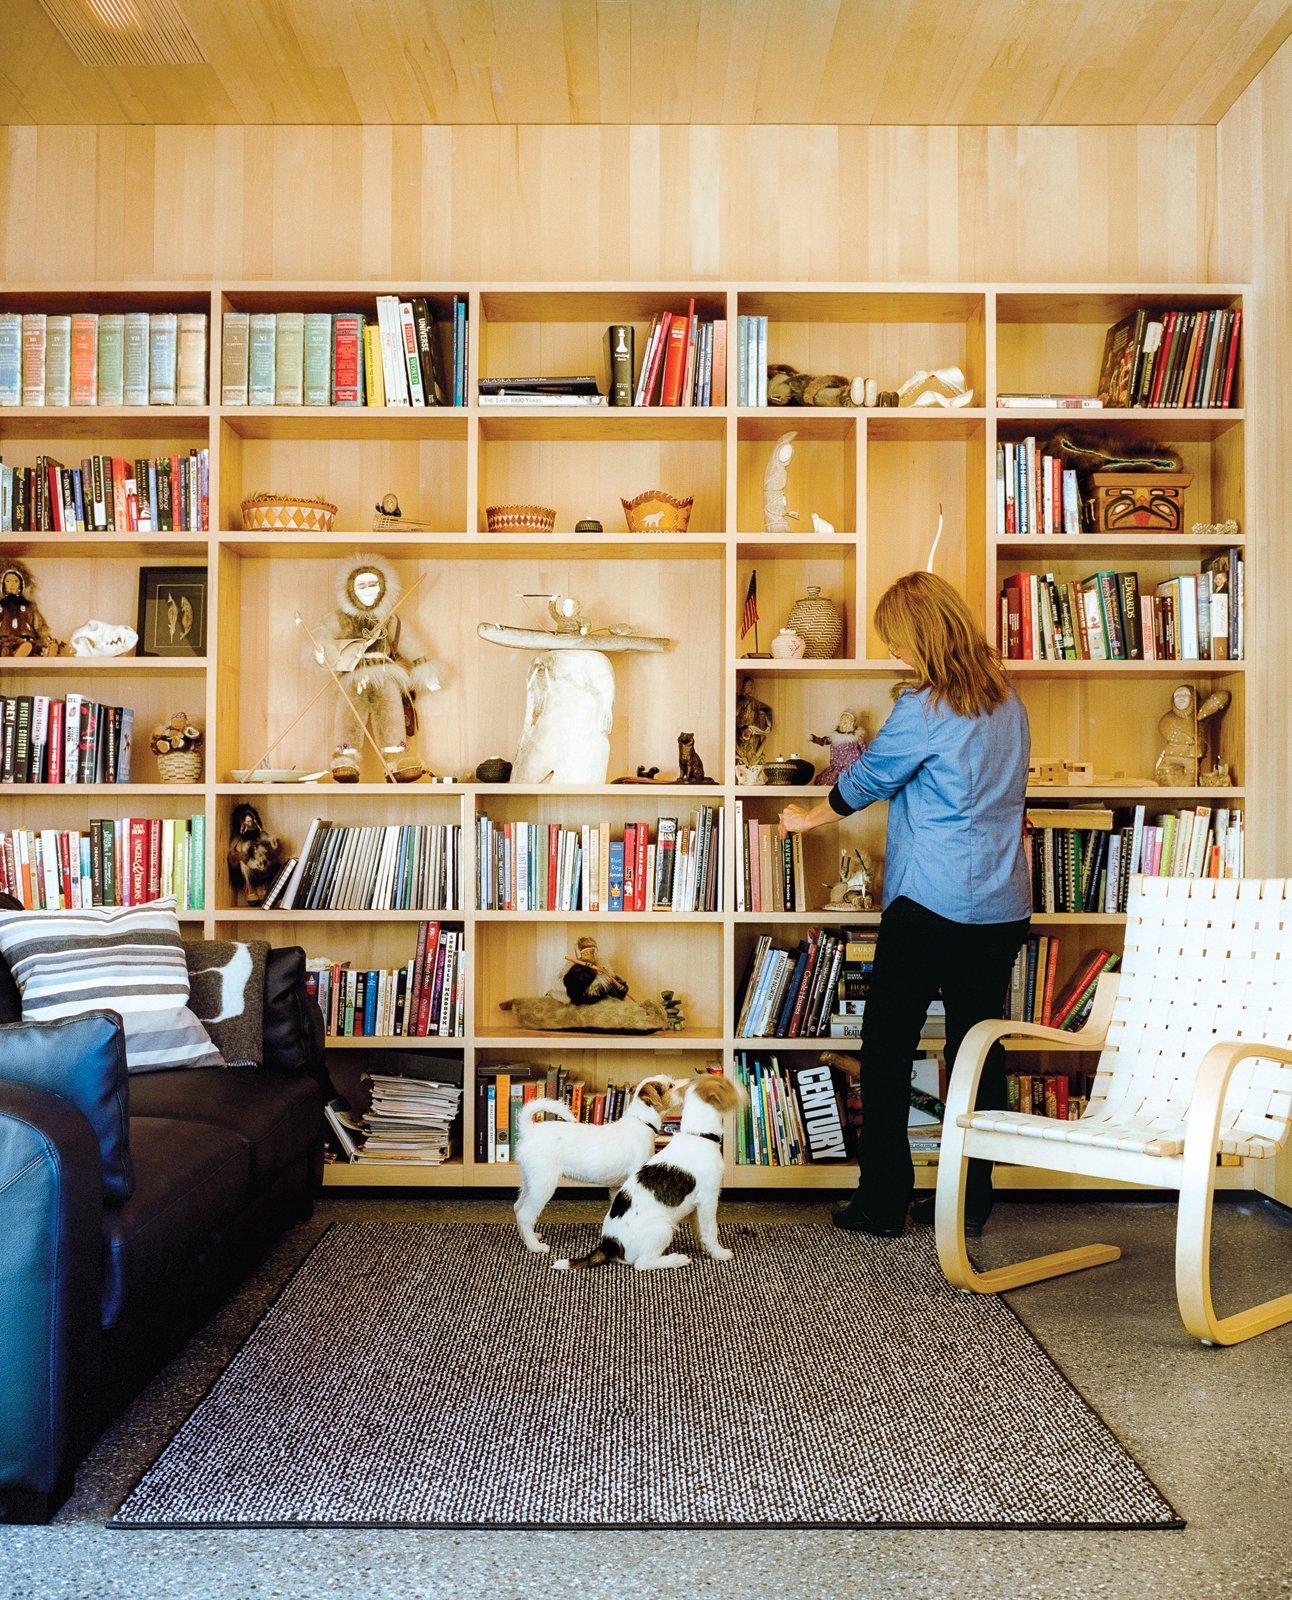 The Art of Arranging: 6 Tips on Creating Stylish Shelf Displays